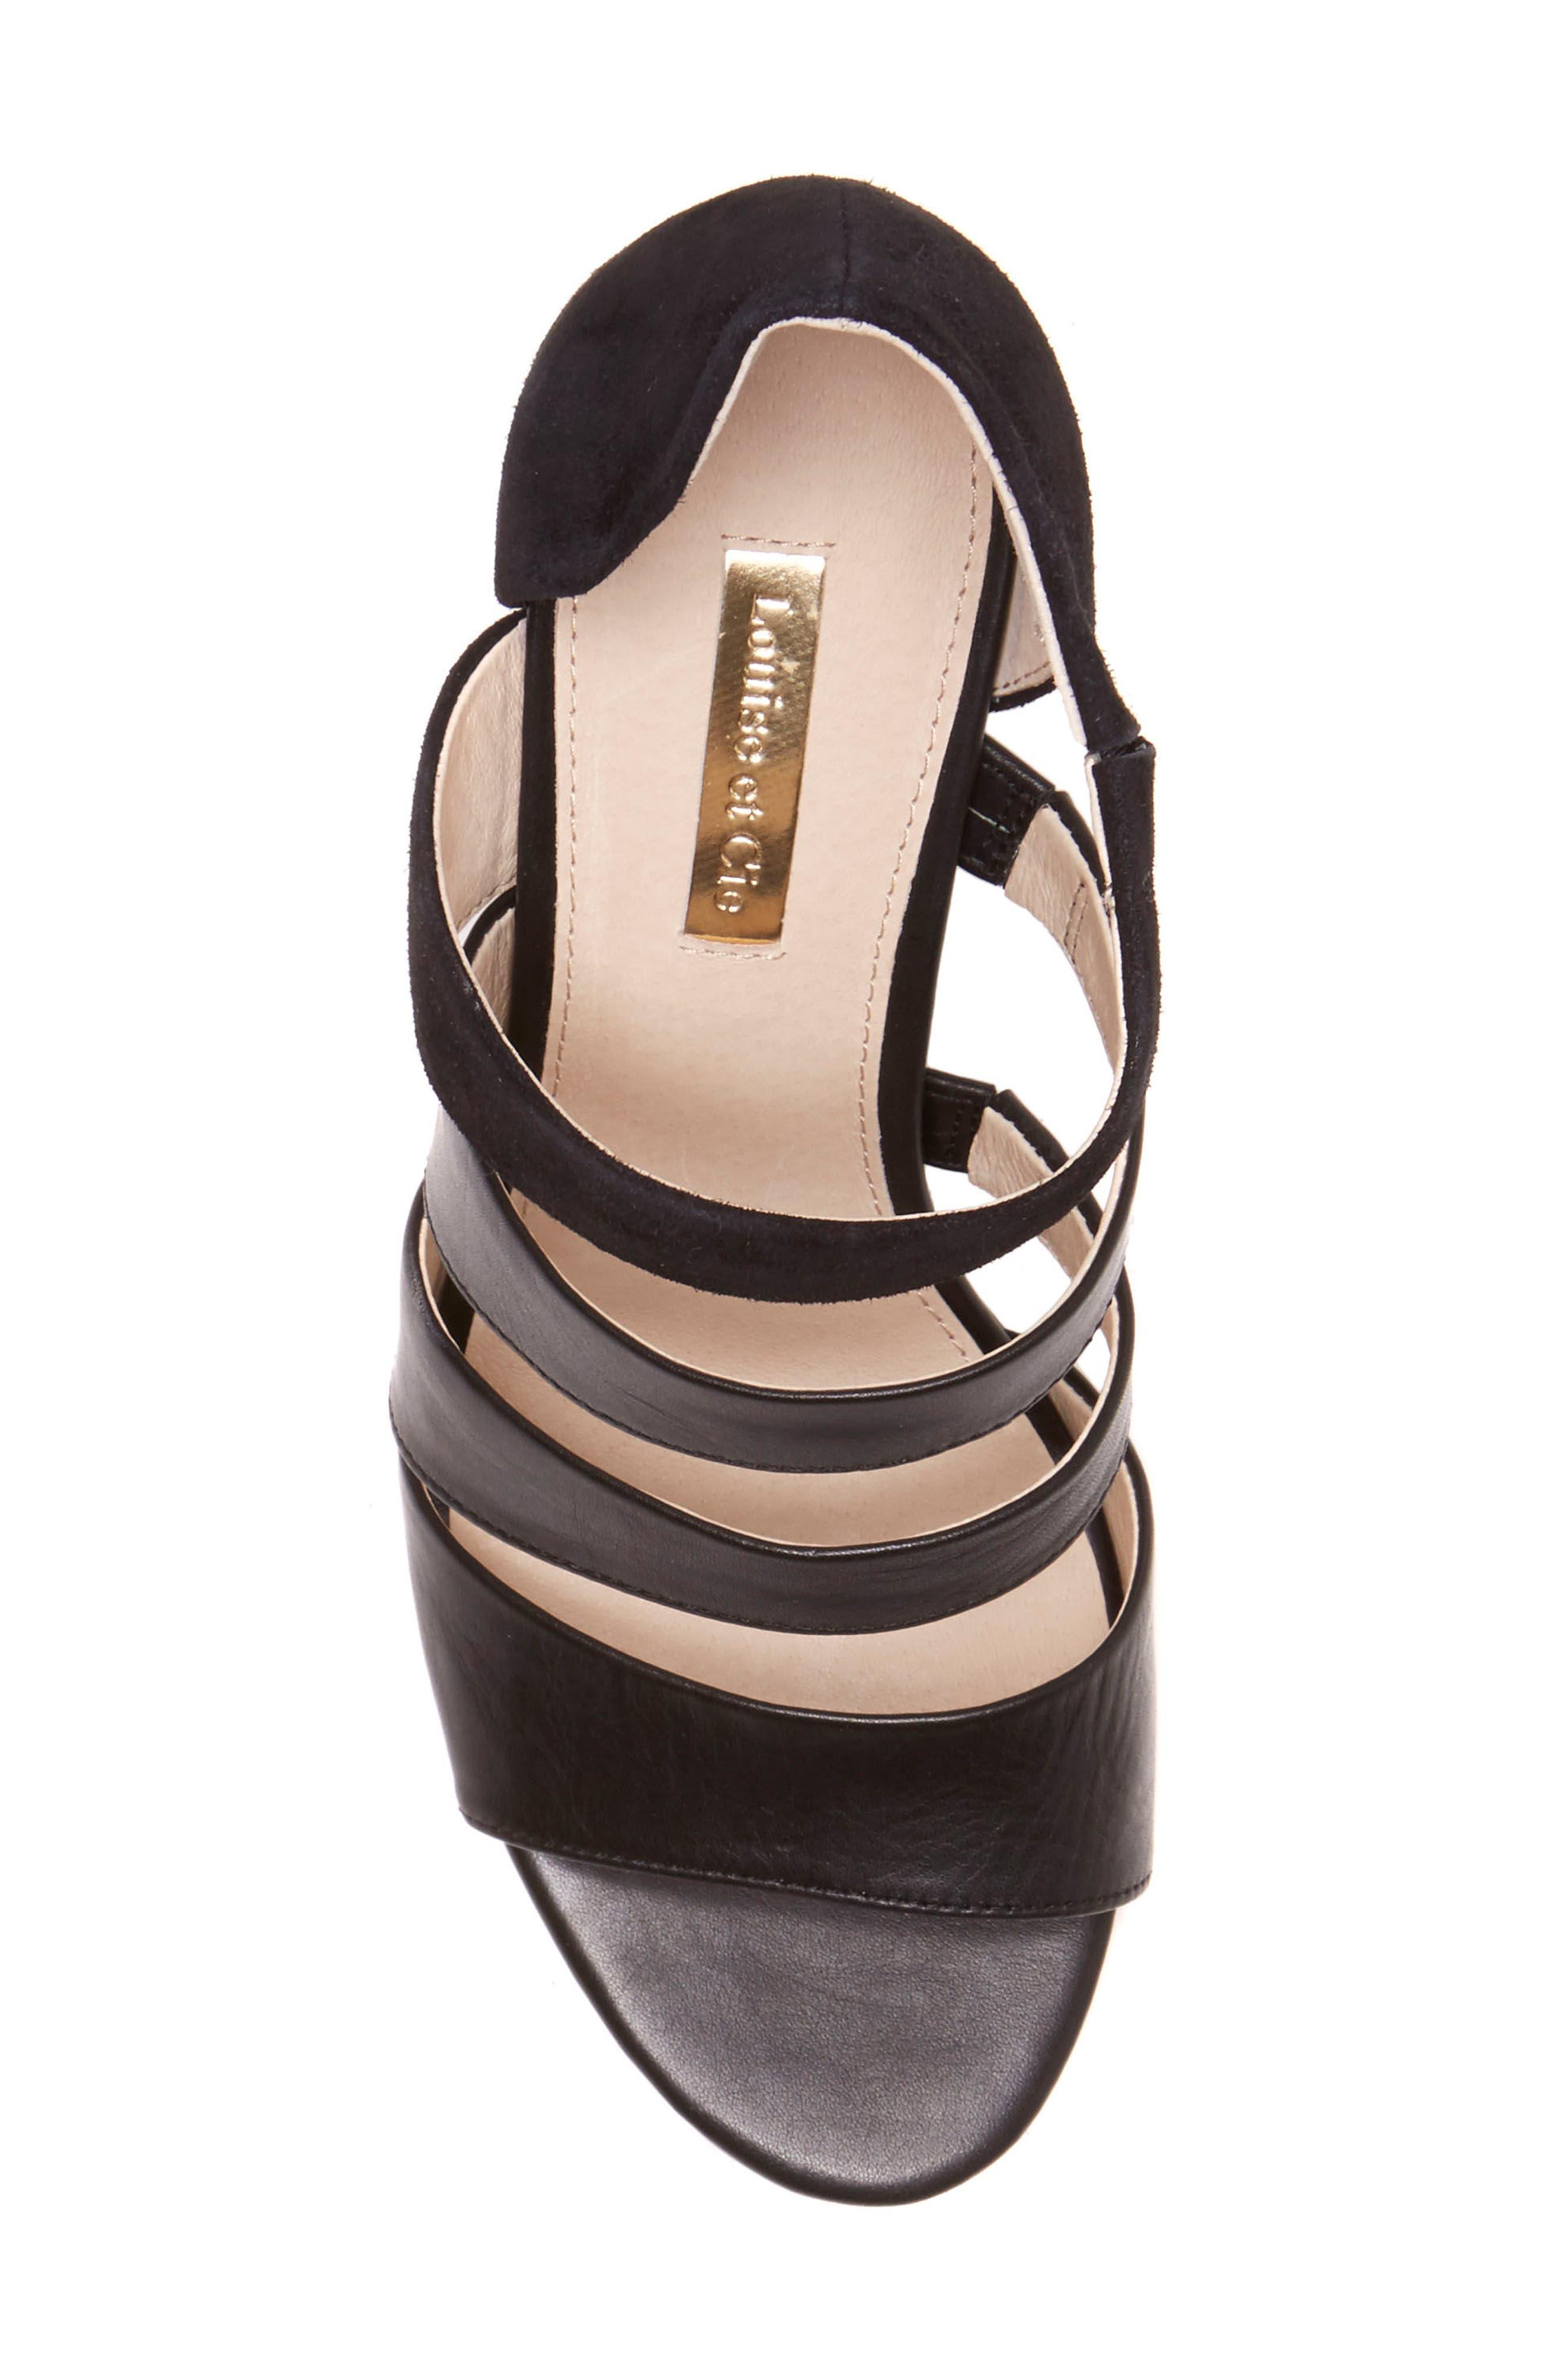 Kainey Strappy Sandal,                             Alternate thumbnail 5, color,                             002